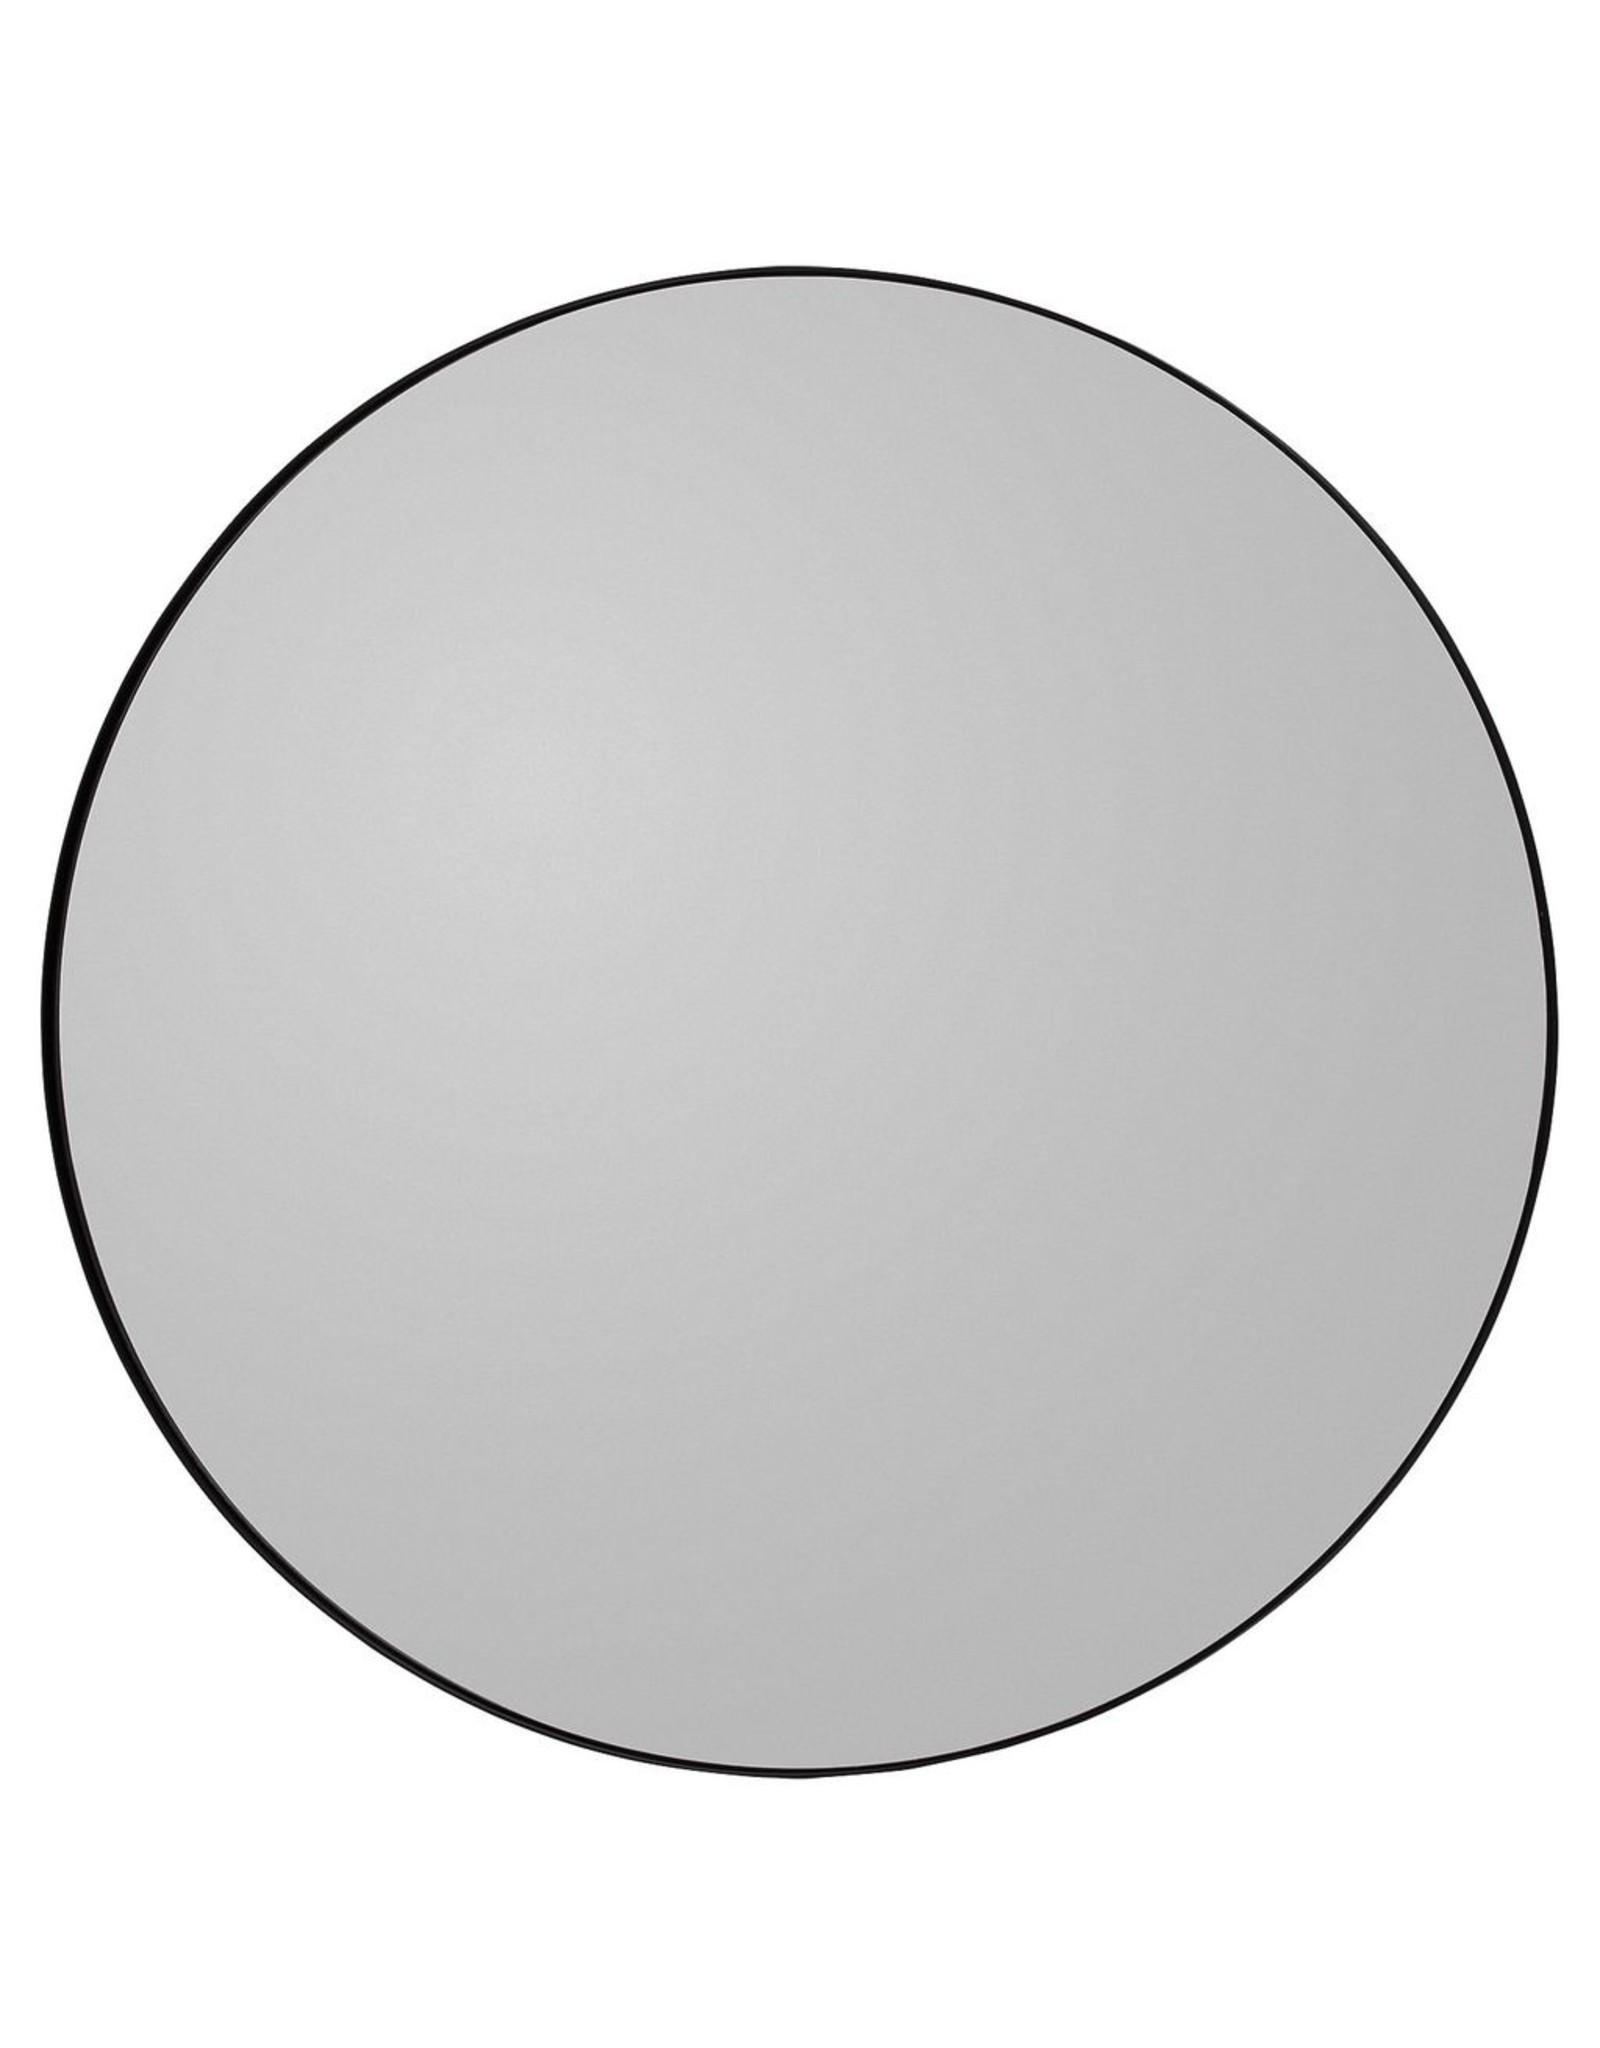 AYTM CIRCUM ROUND MIRROR Black Ø90